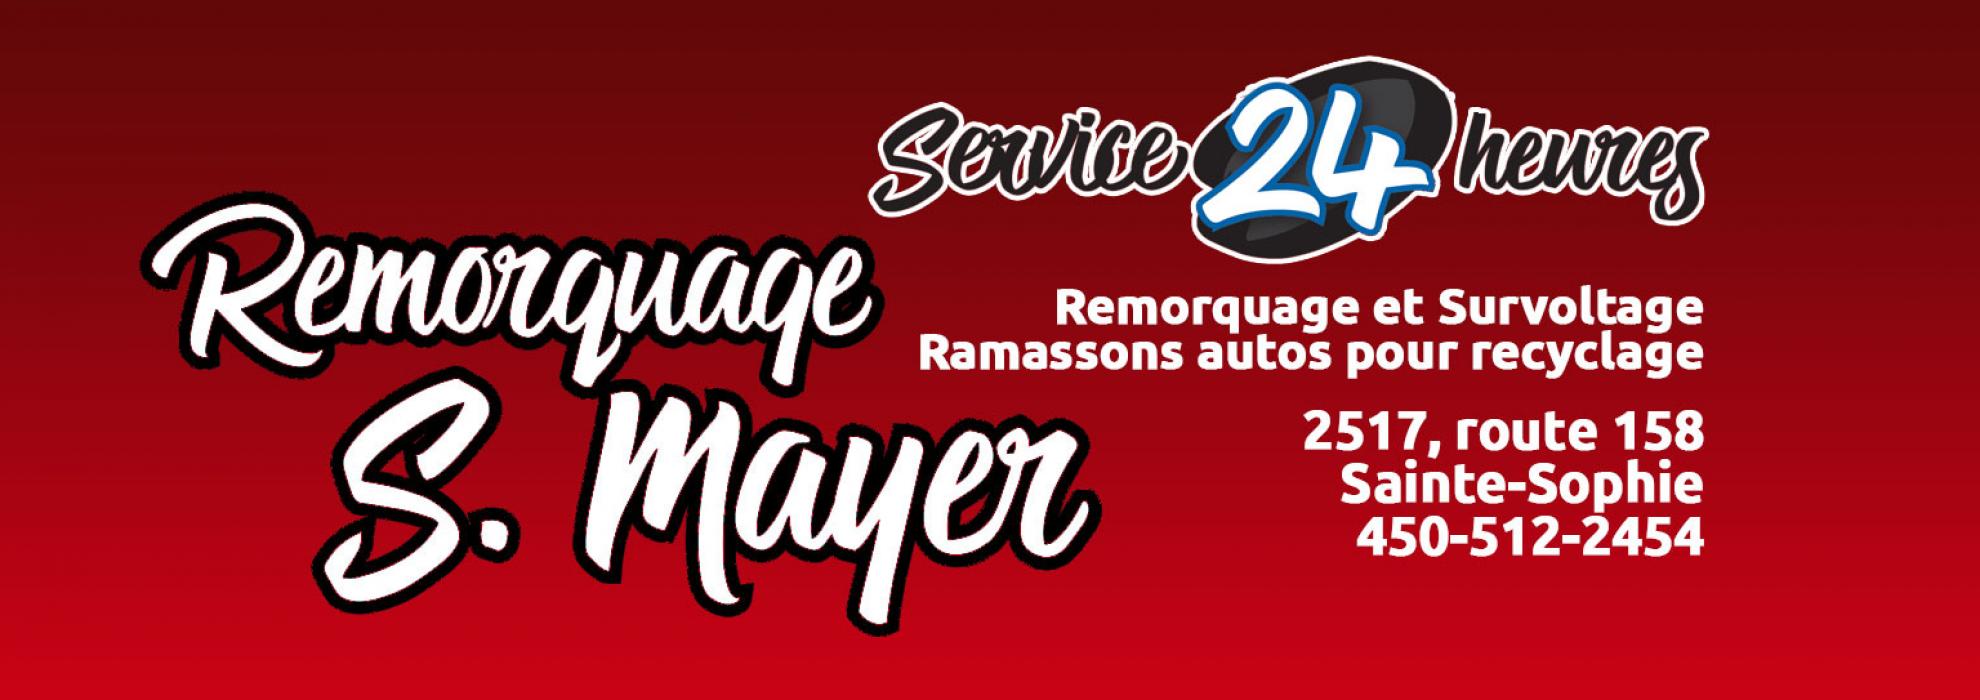 Service 24H